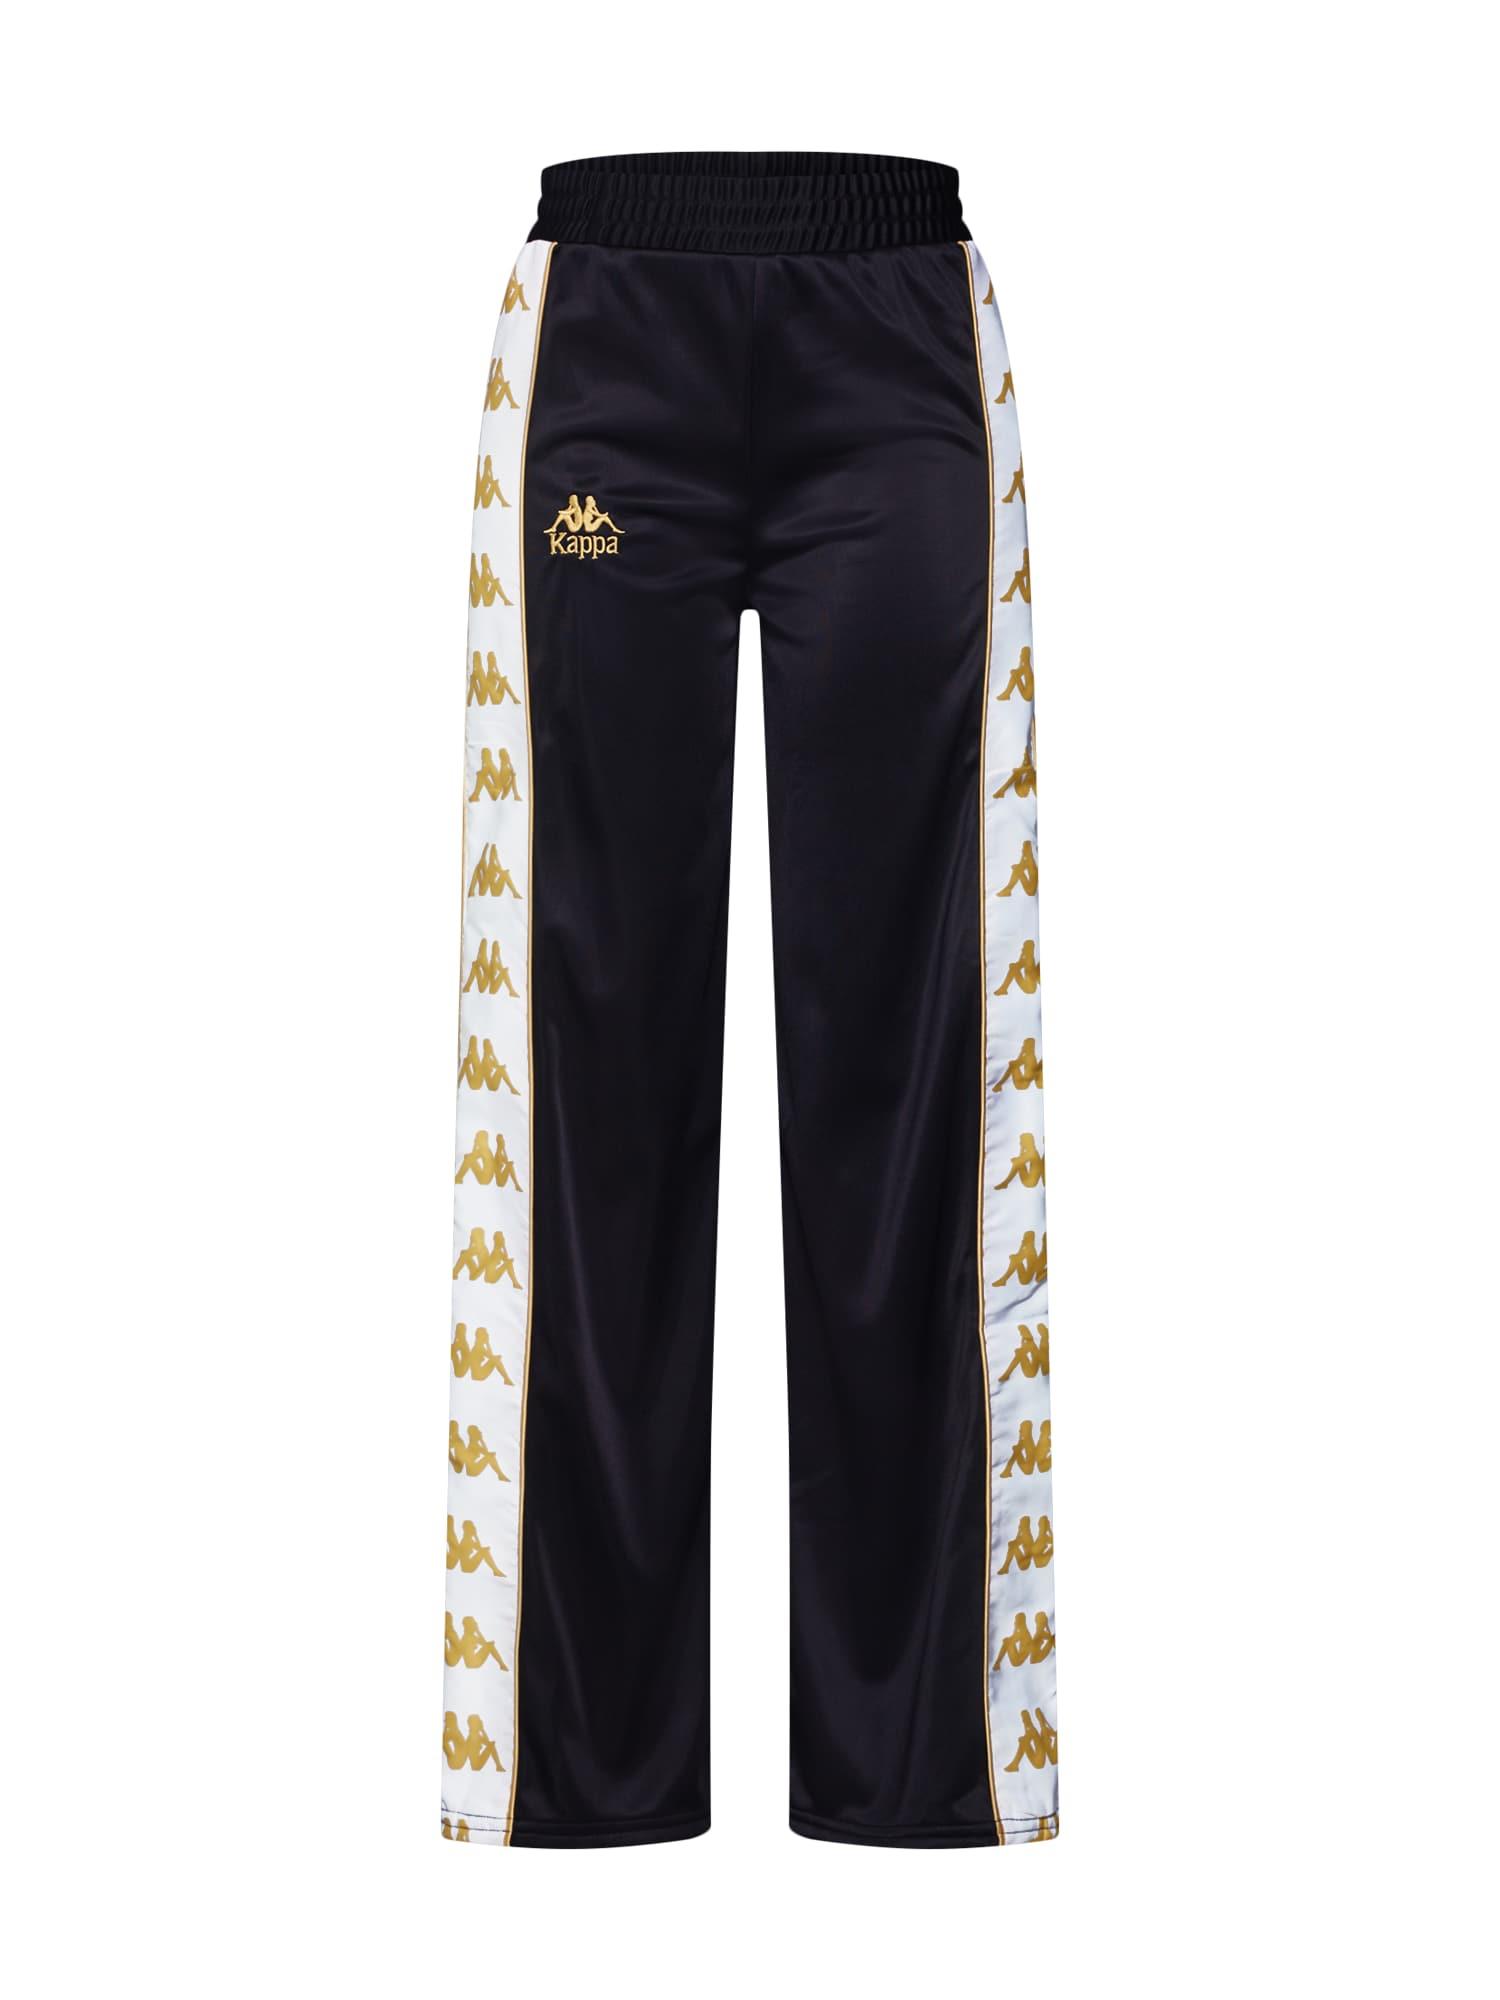 Kalhoty EILEEN zlatá černá bílá KAPPA